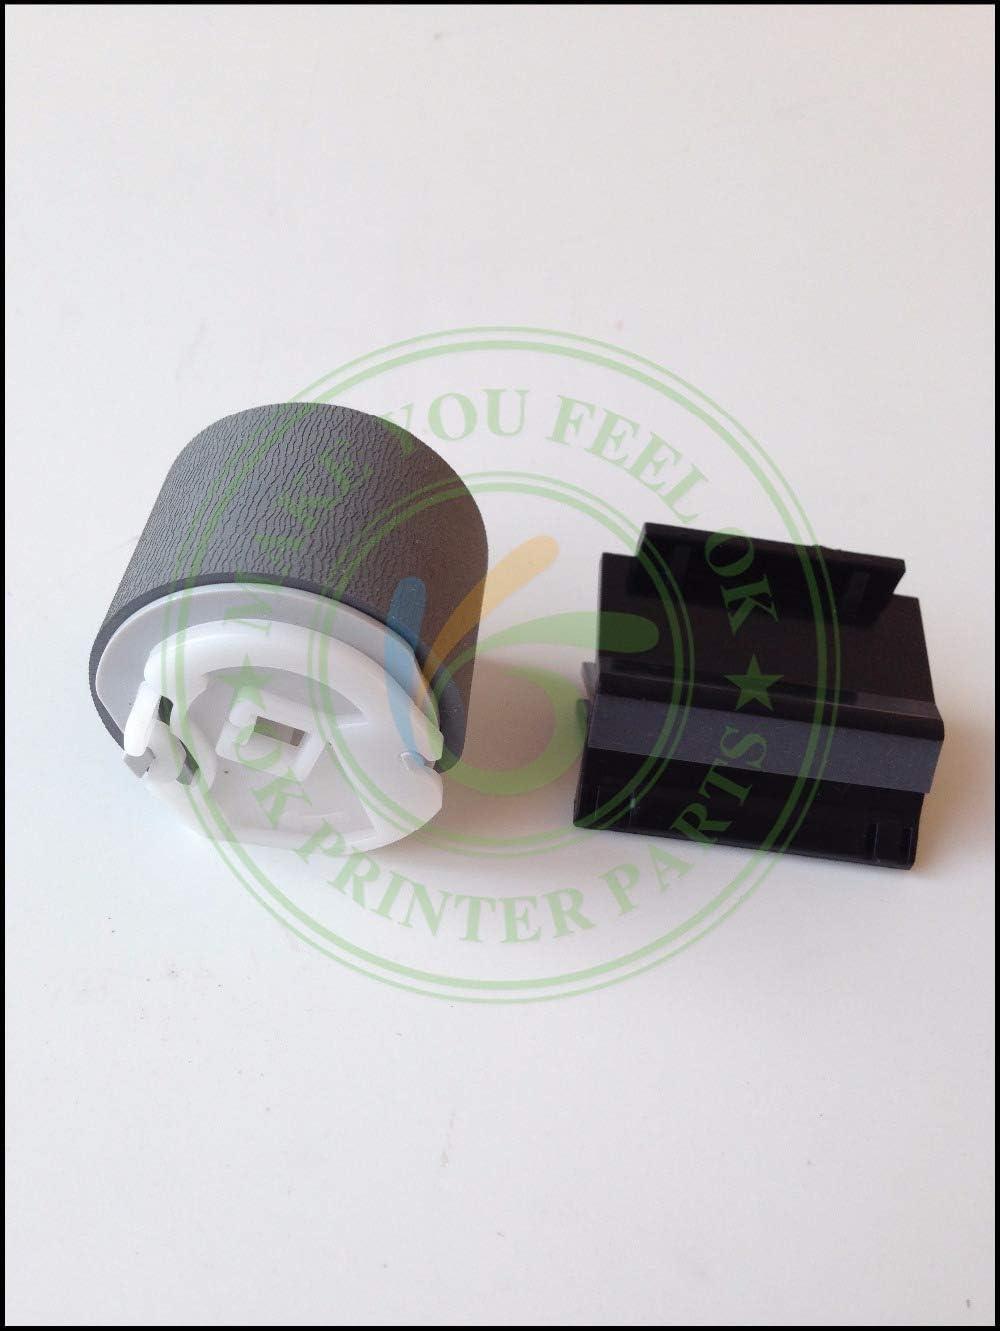 Printer Spare Parts Jc73-00211A Jc97-02217A Pickup Roller Separation Pad for Samsung Ml1610 Ml1640 Ml2010 Scx4521 Scx4725 Ml2241 Clp300 Clx2160 3160